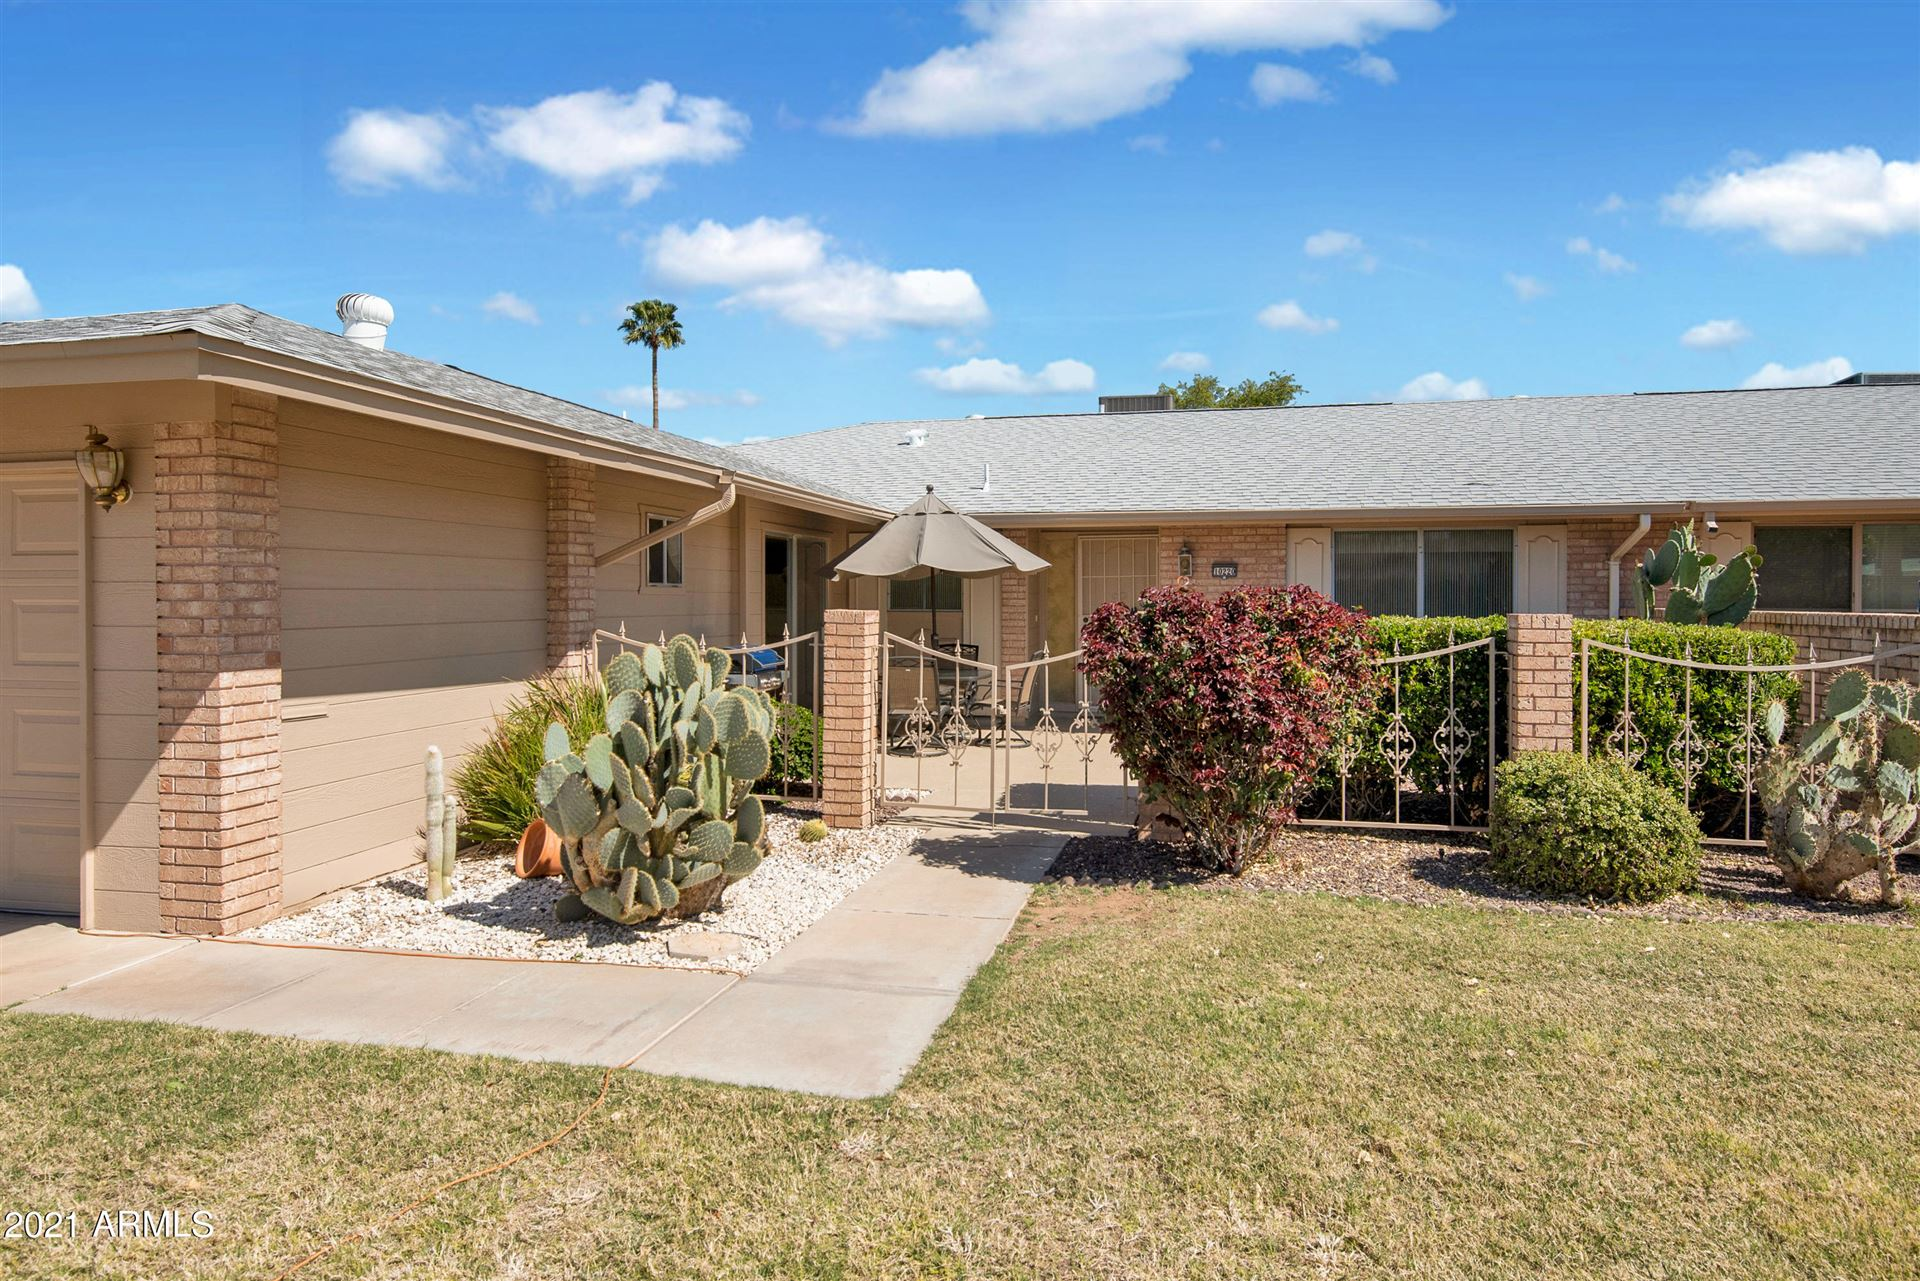 Photo of 10220 W PINERIDGE Drive, Sun City, AZ 85351 (MLS # 6200500)